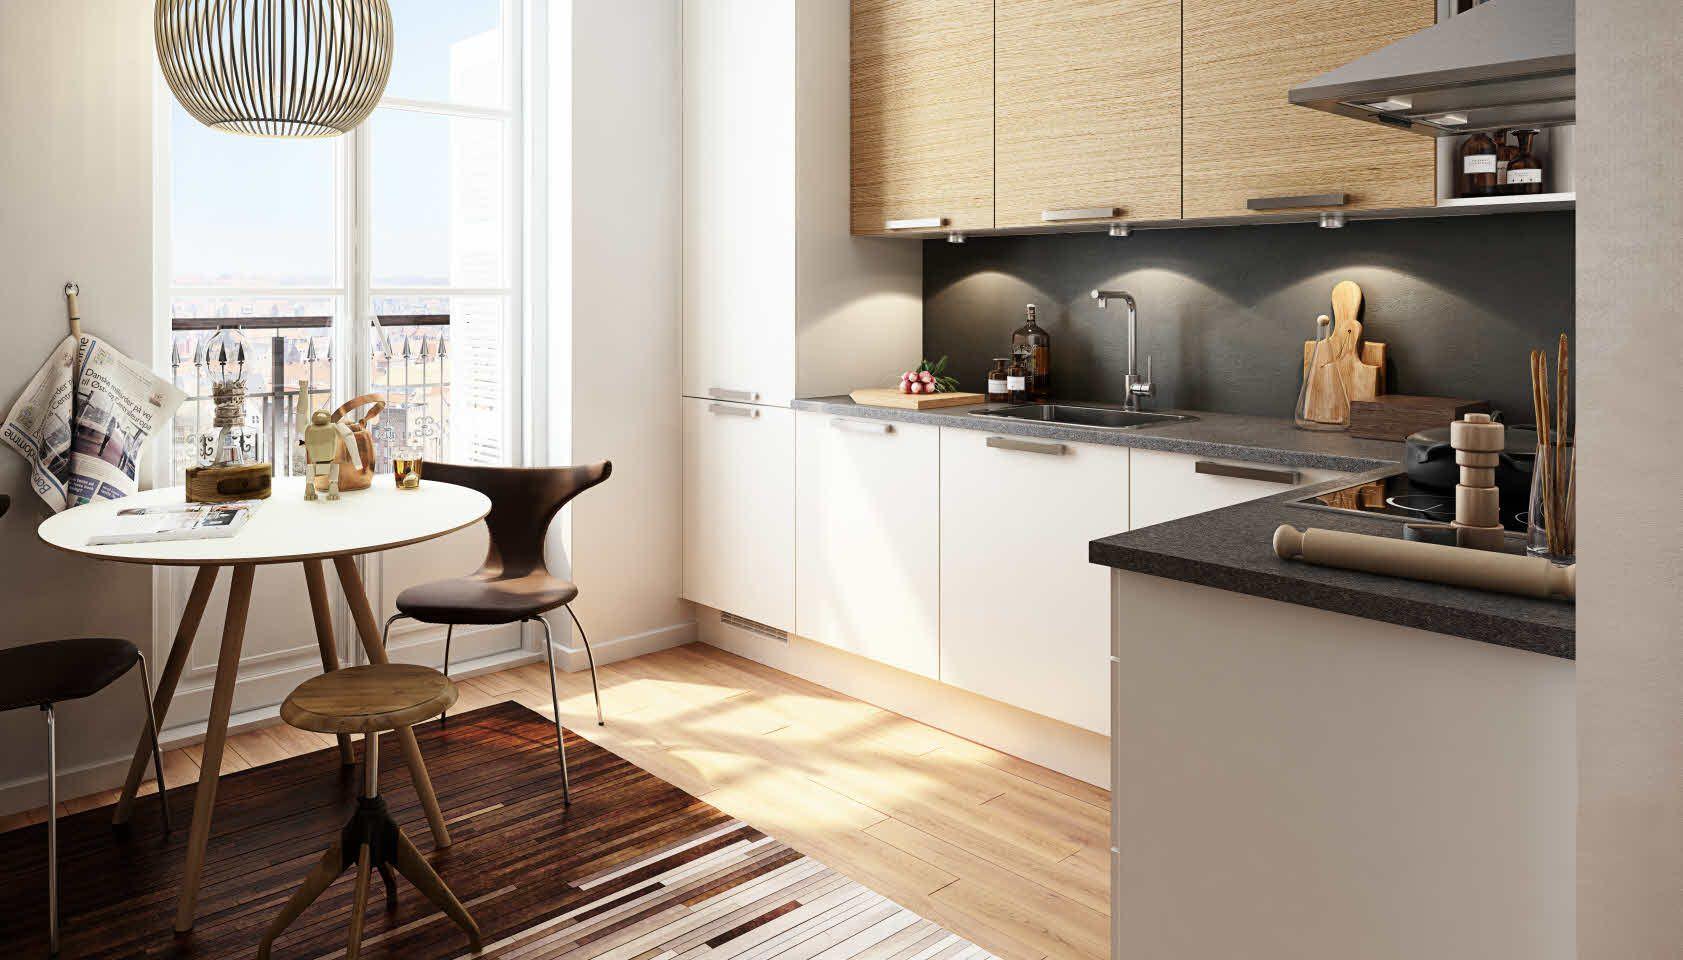 moderni keittiö - Google-haku